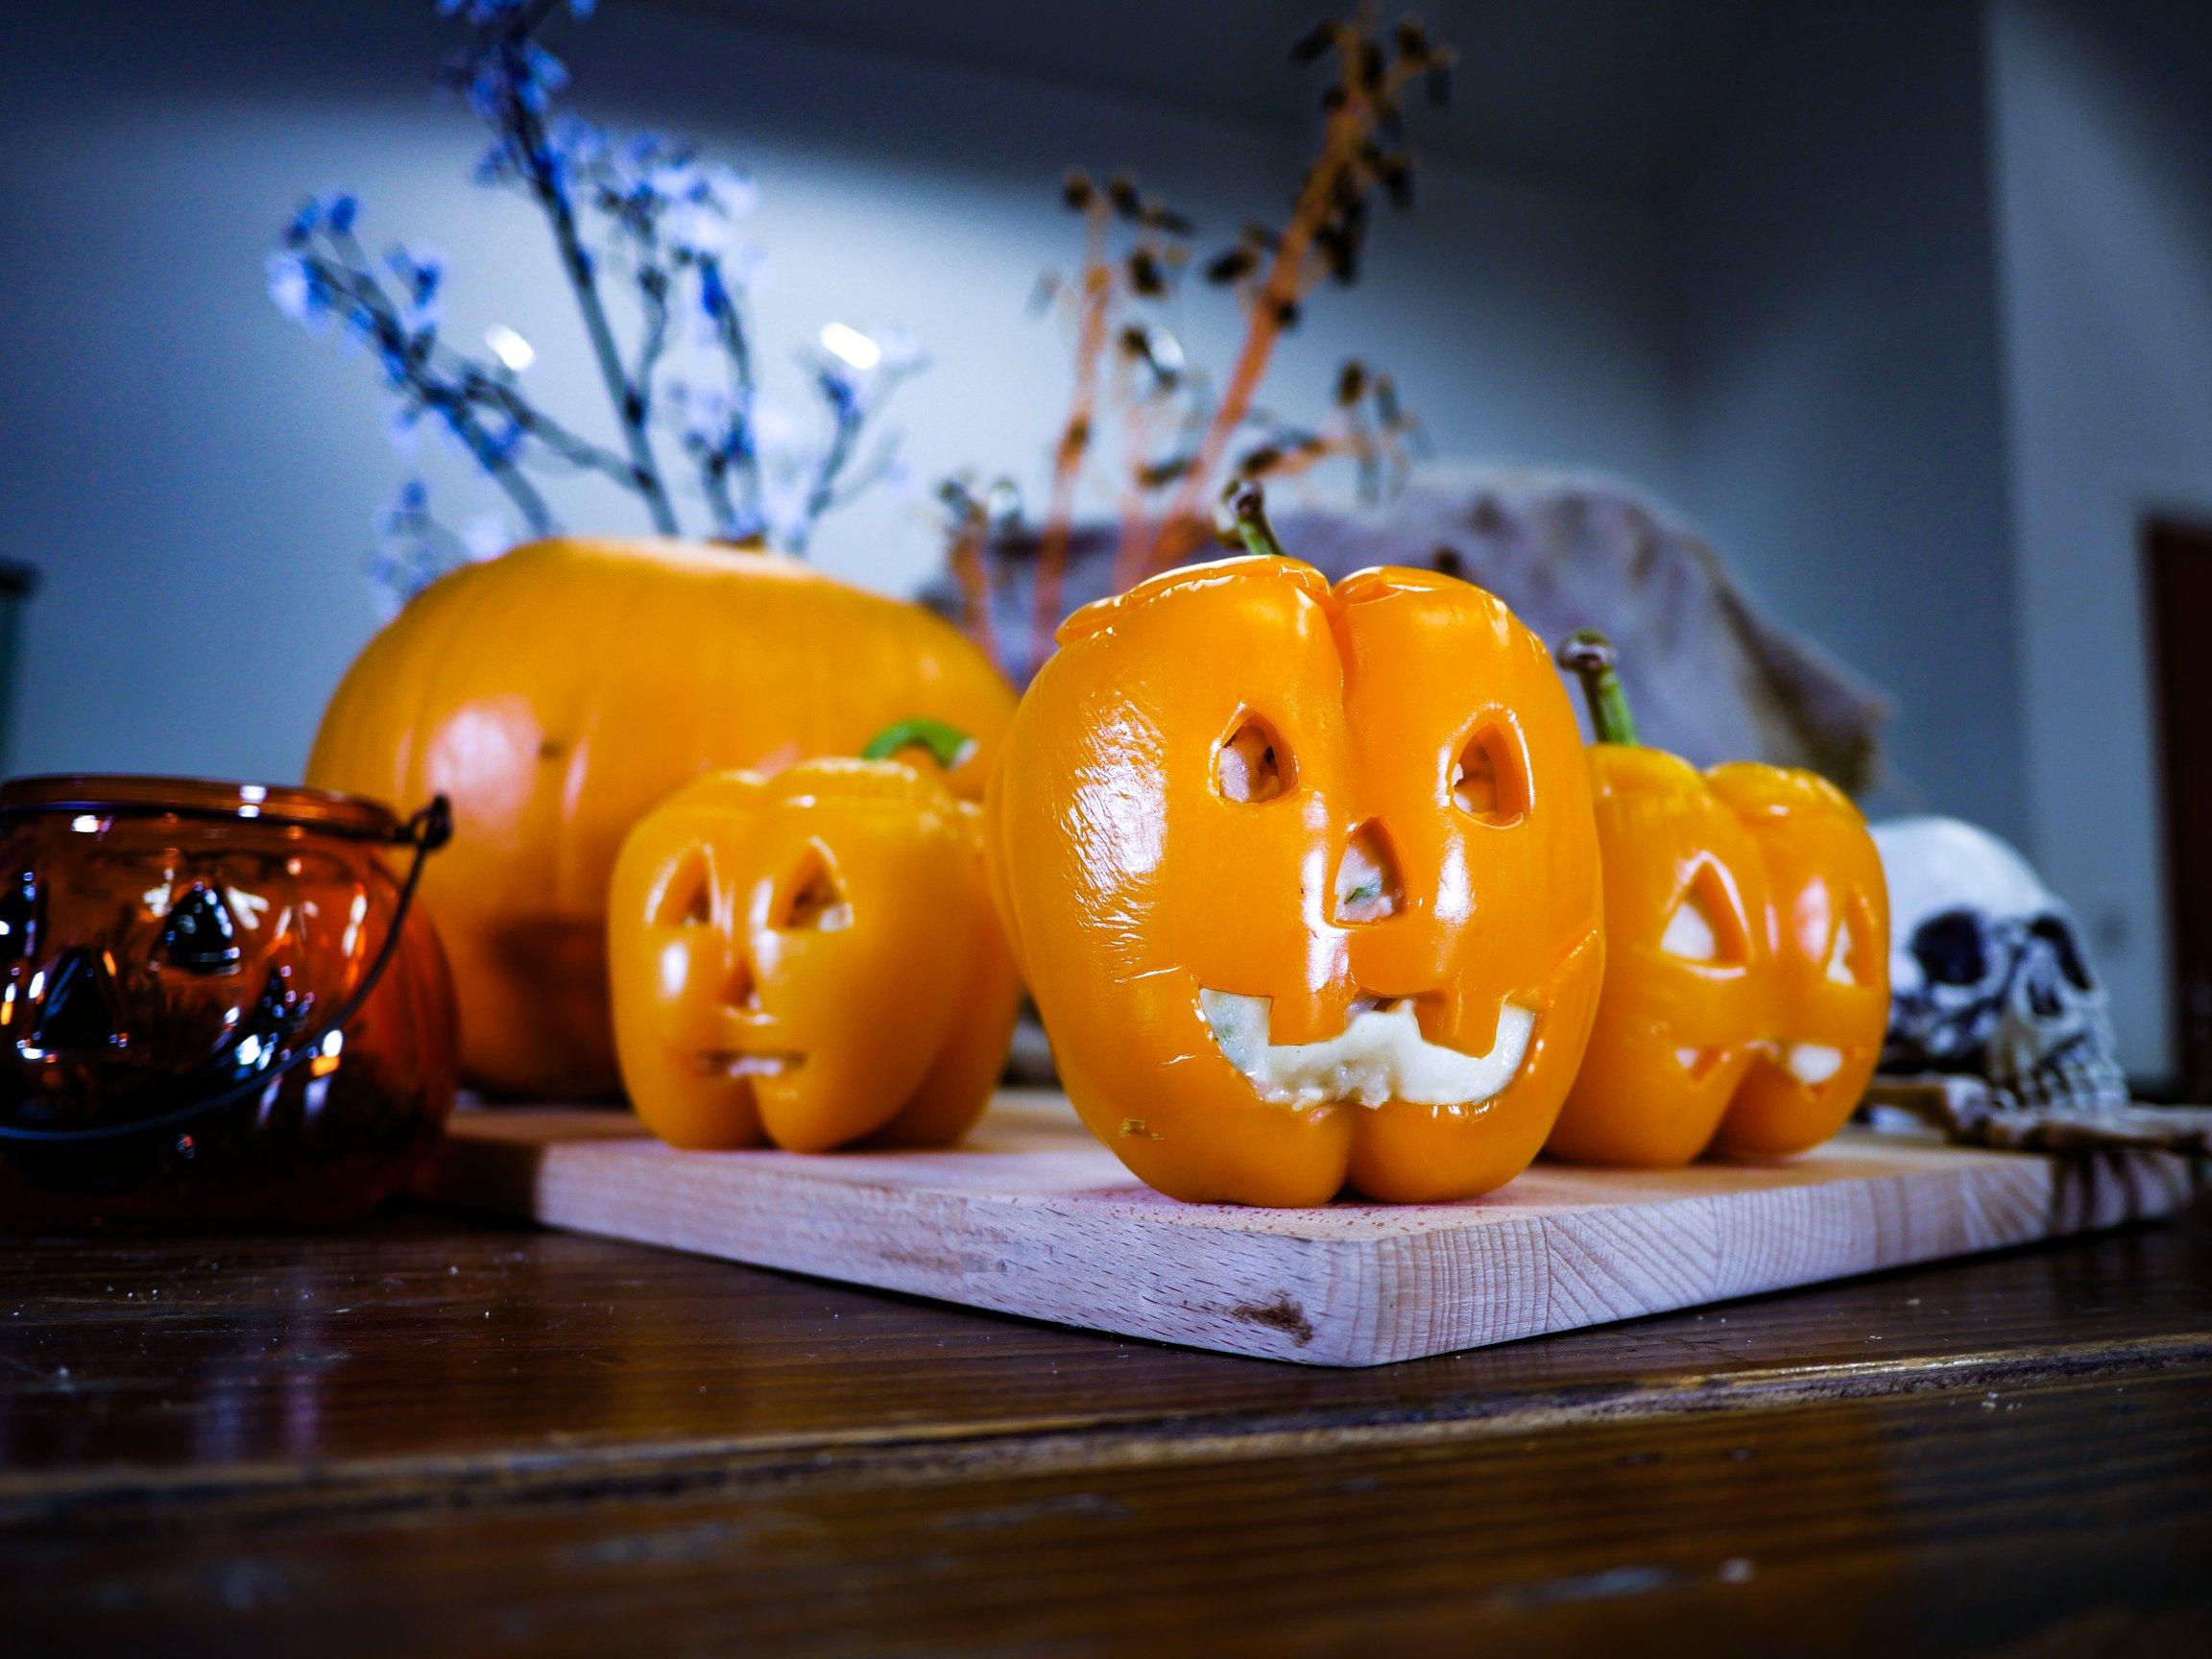 Halloween - Stuffed Jack-o Lantern Peppers